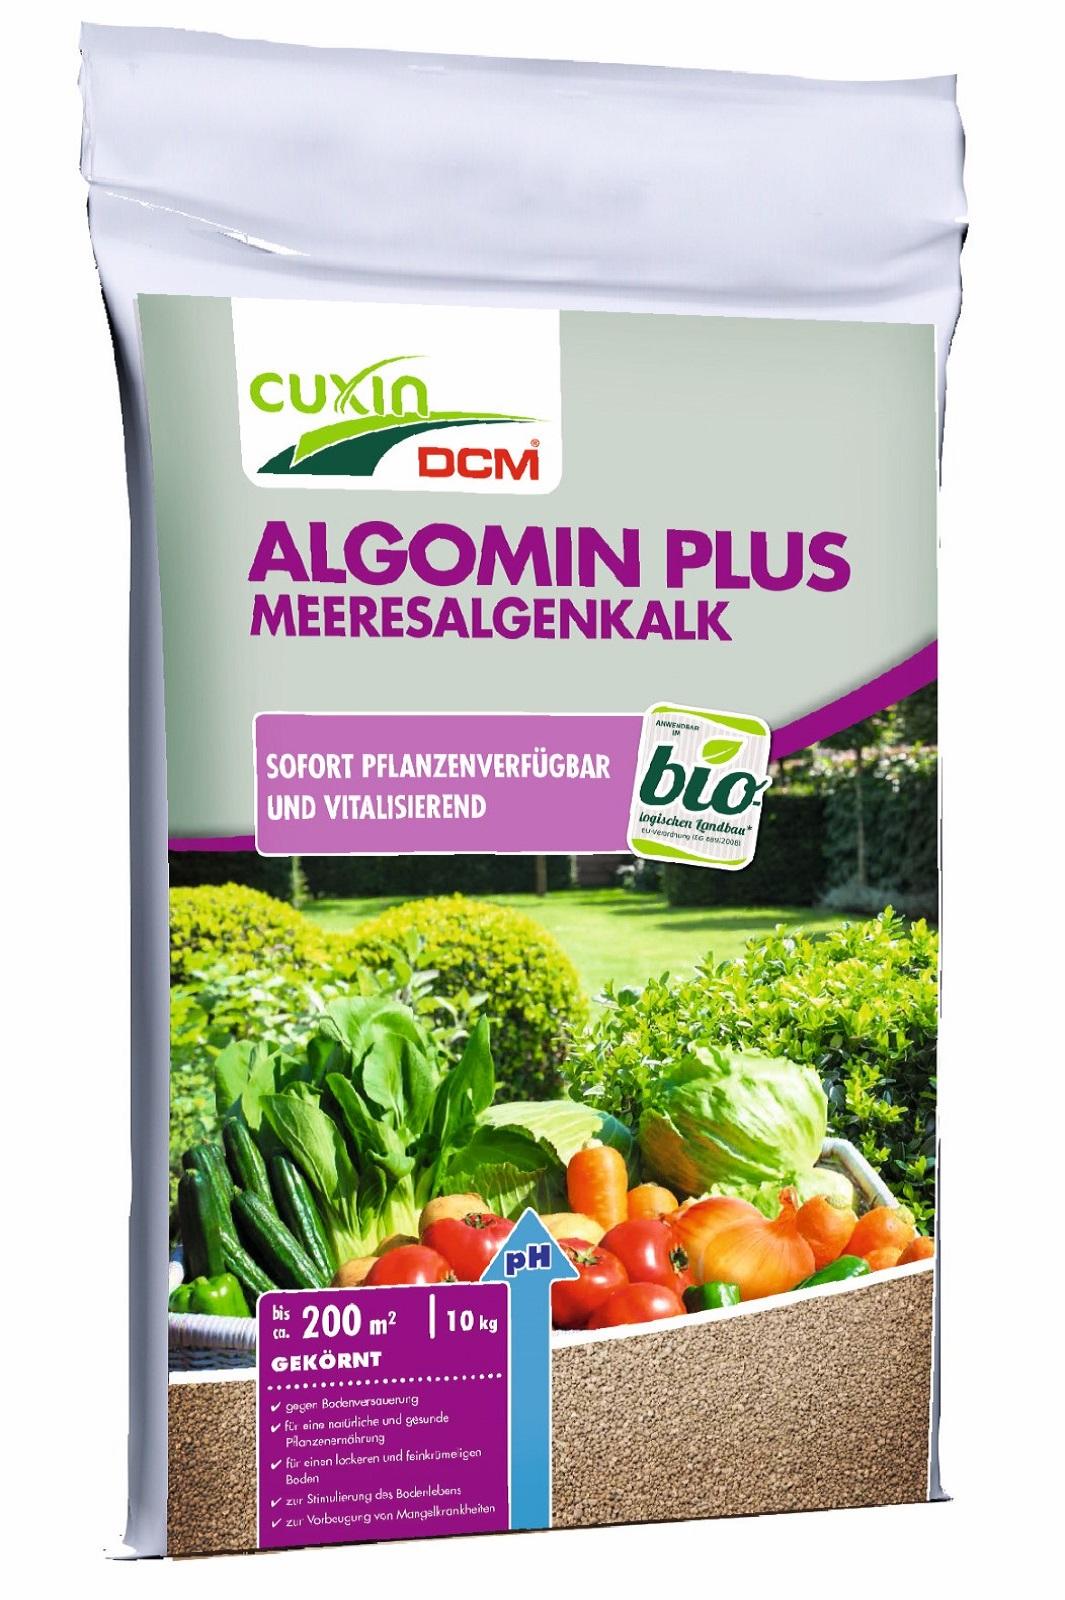 Algomin plus granuliert 10 kg